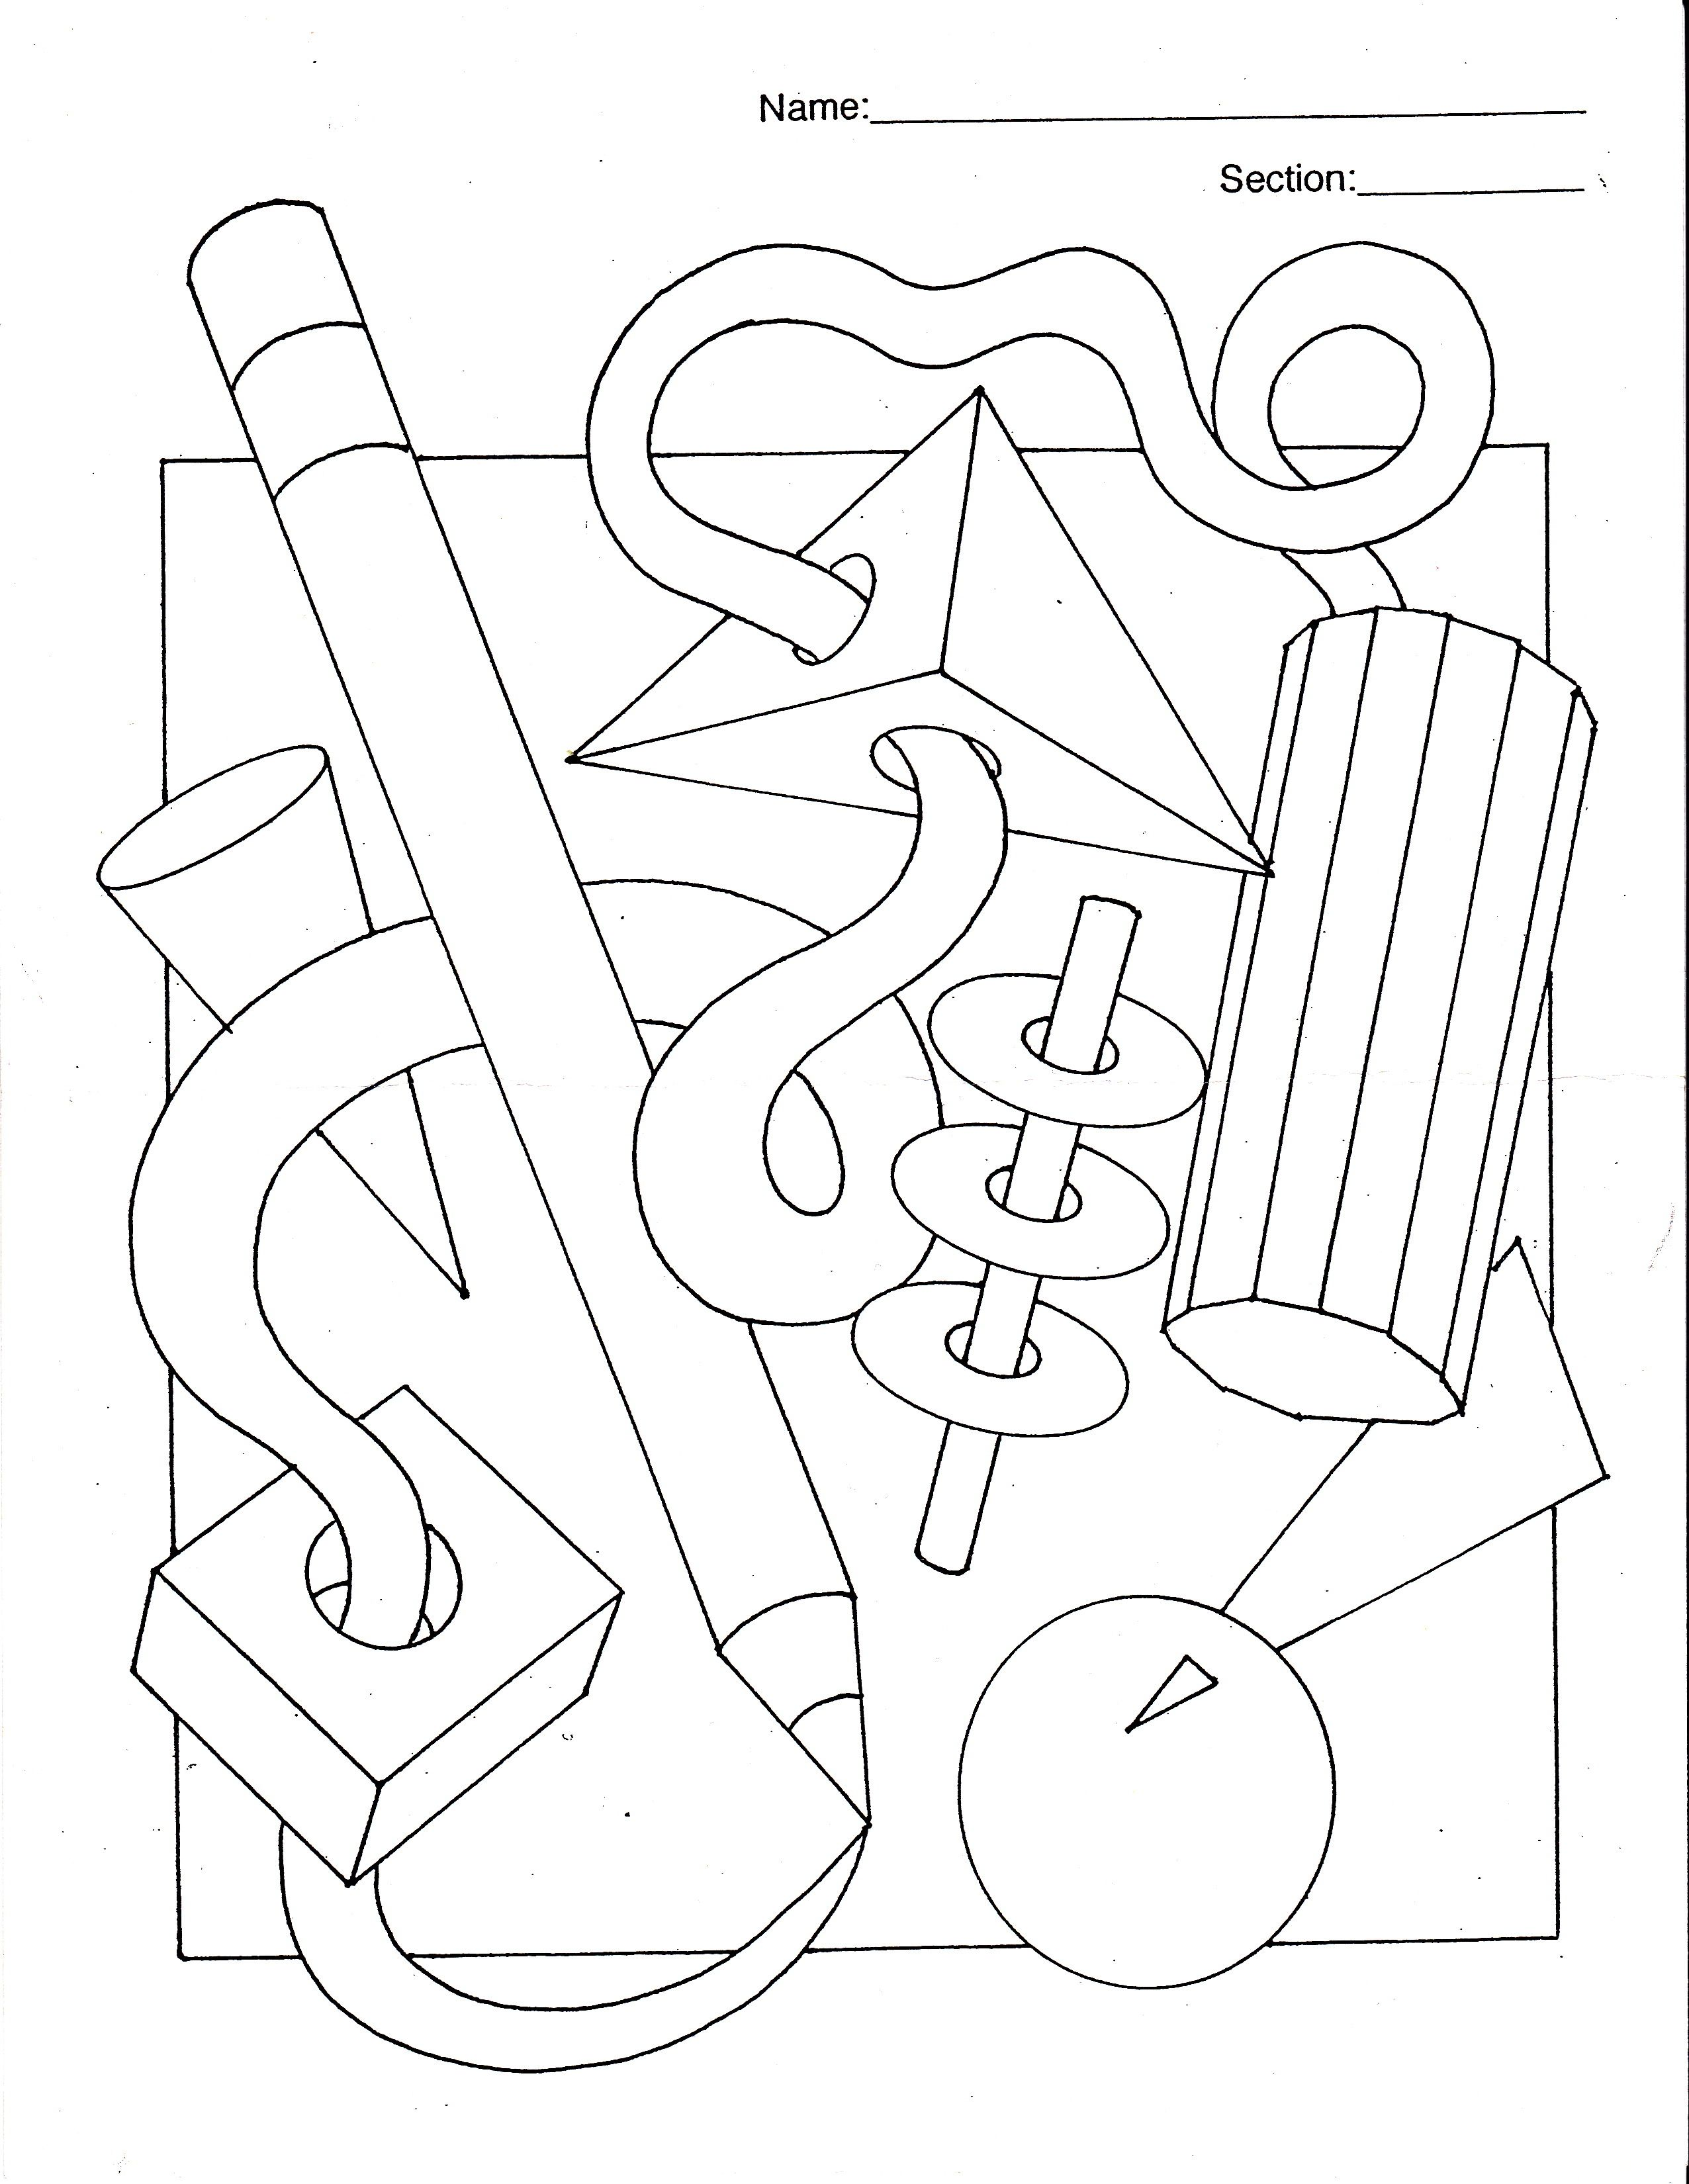 6th Grade Colored Pencil Unit | Visual art lessons, Art ...